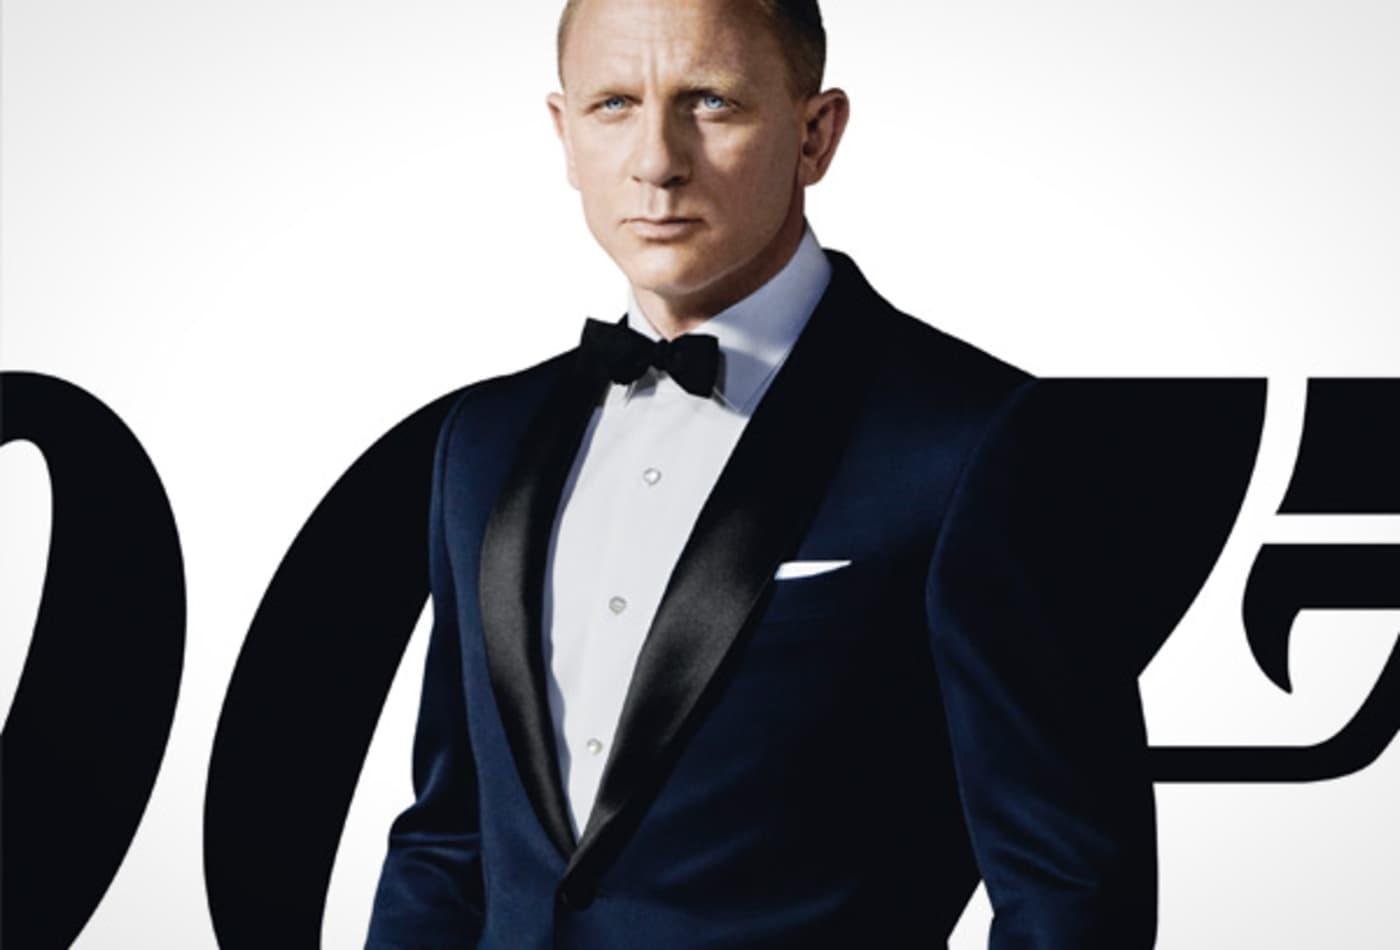 James-Bond-Collectibles-dinner-jacket2.jpg